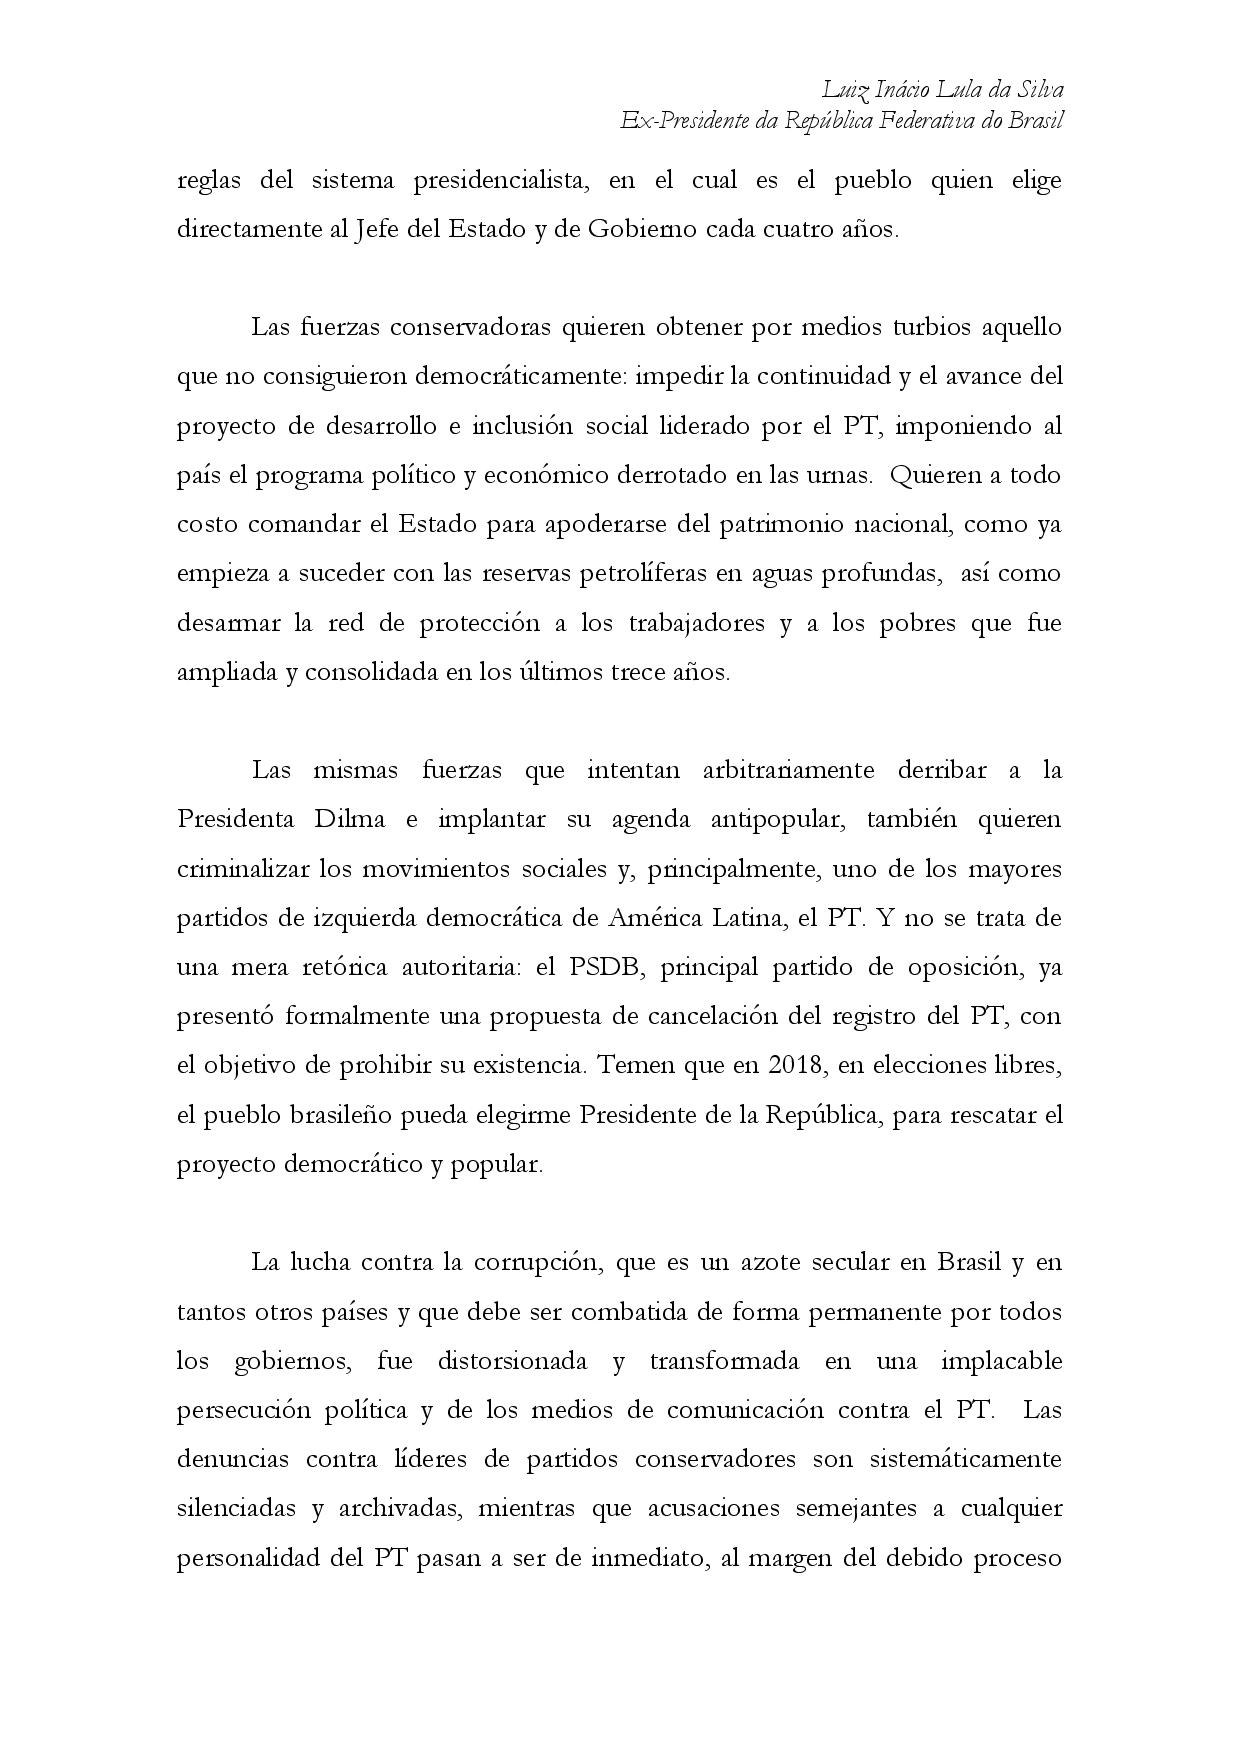 Argentina Ex-presidenta-page-004